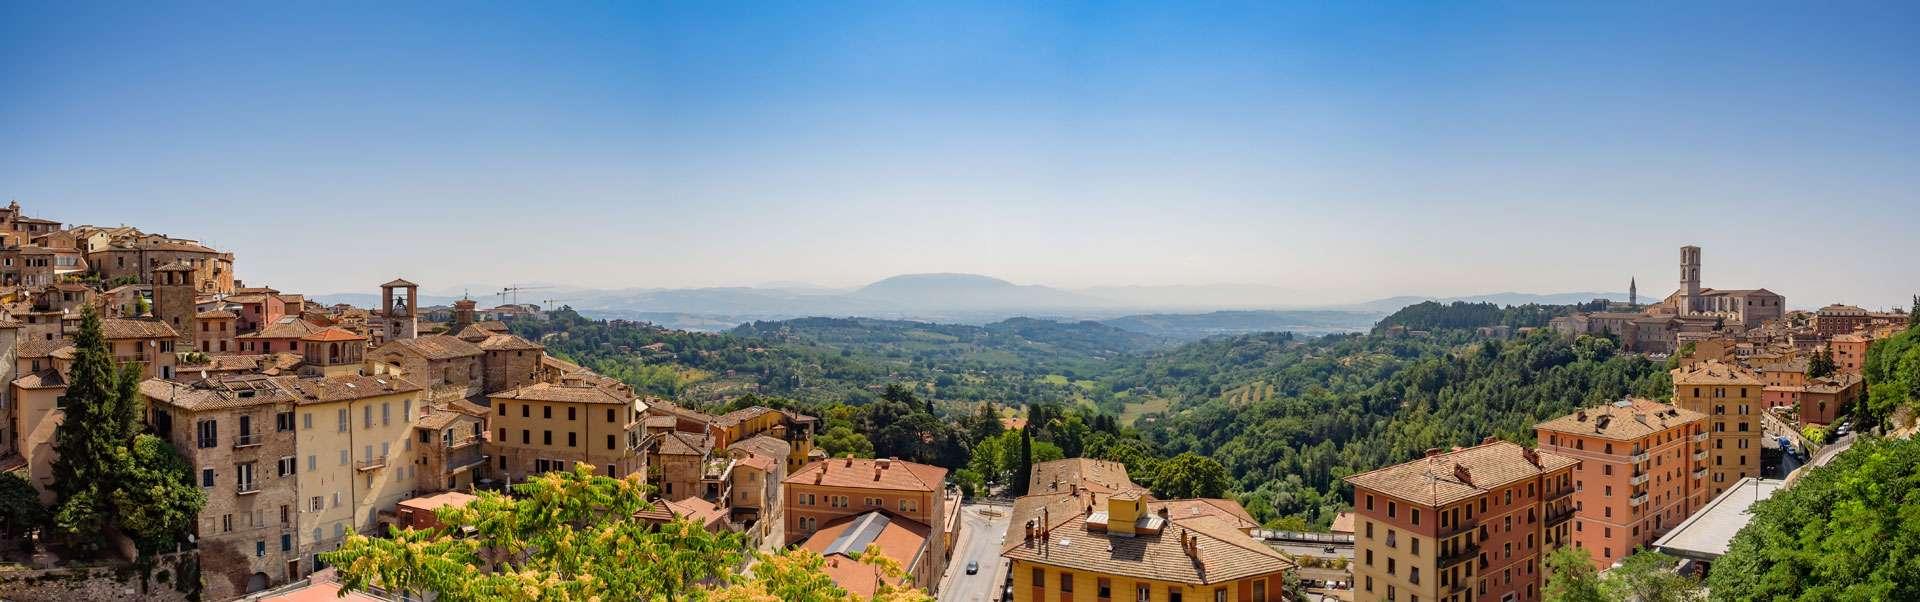 Why Umbria Should be your Next Destination